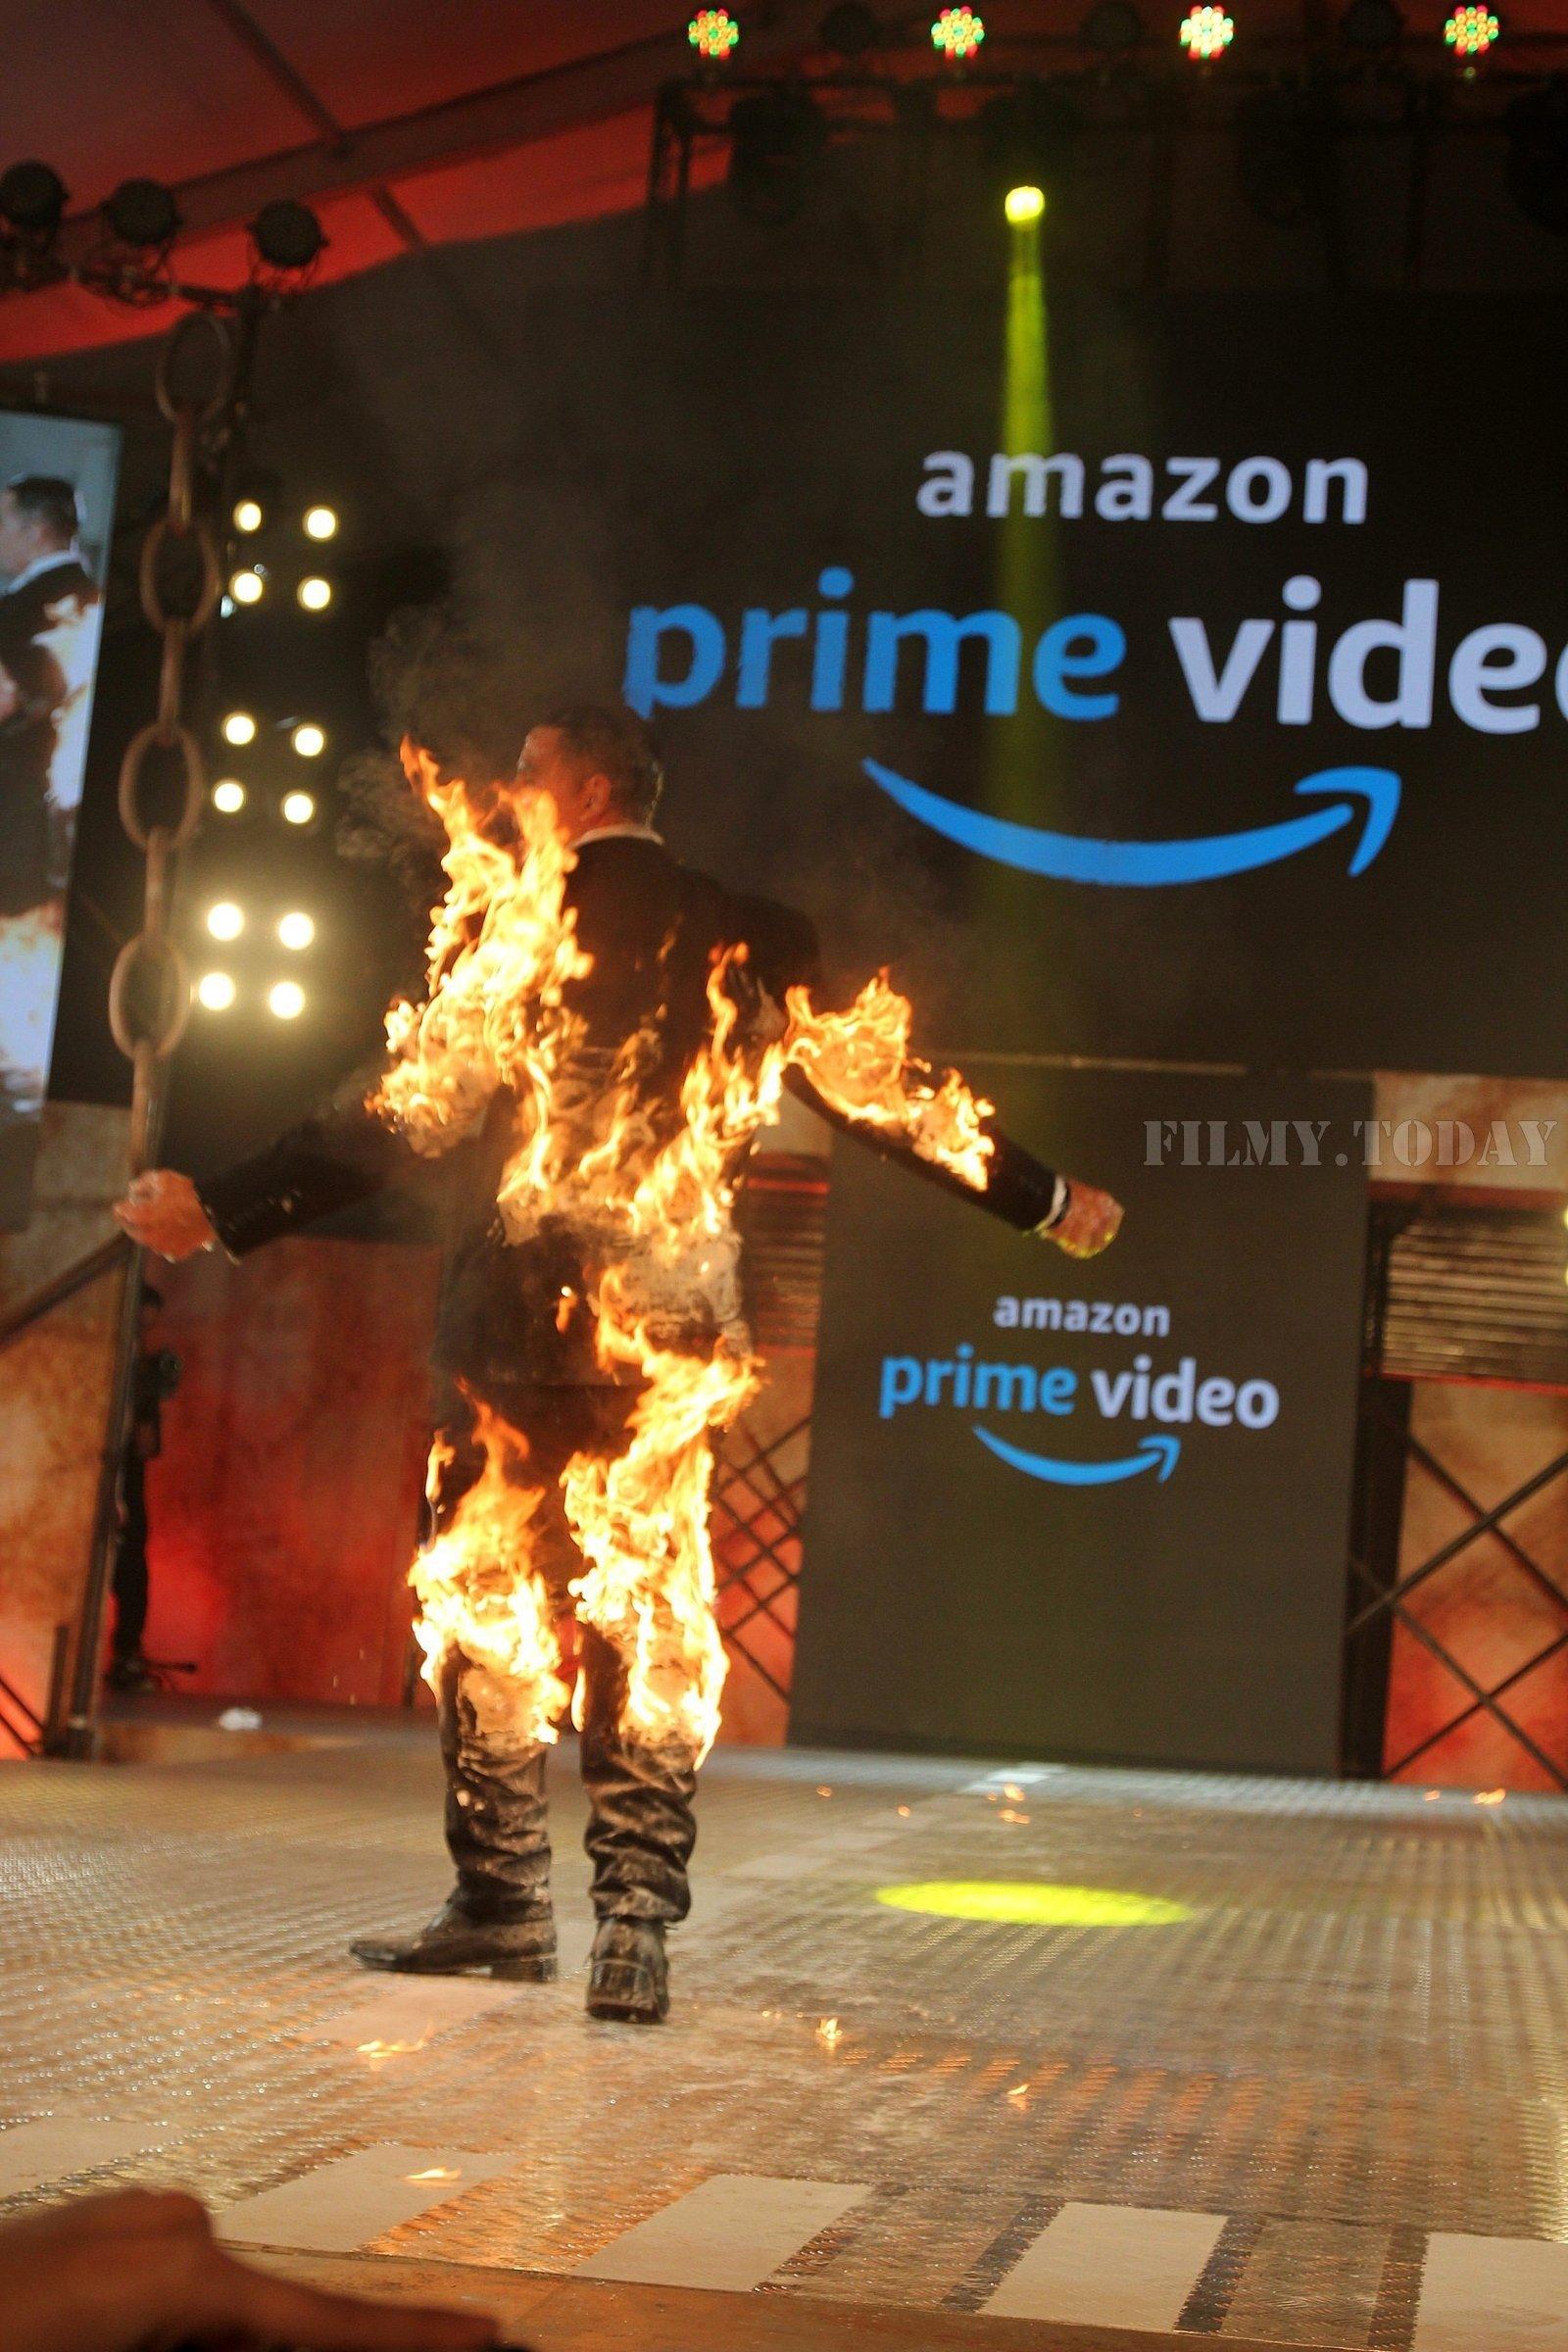 Akshay Kumar - Photos: Akshay Kumar makes his digital debut with Amazon Prime Video | Picture 1632002